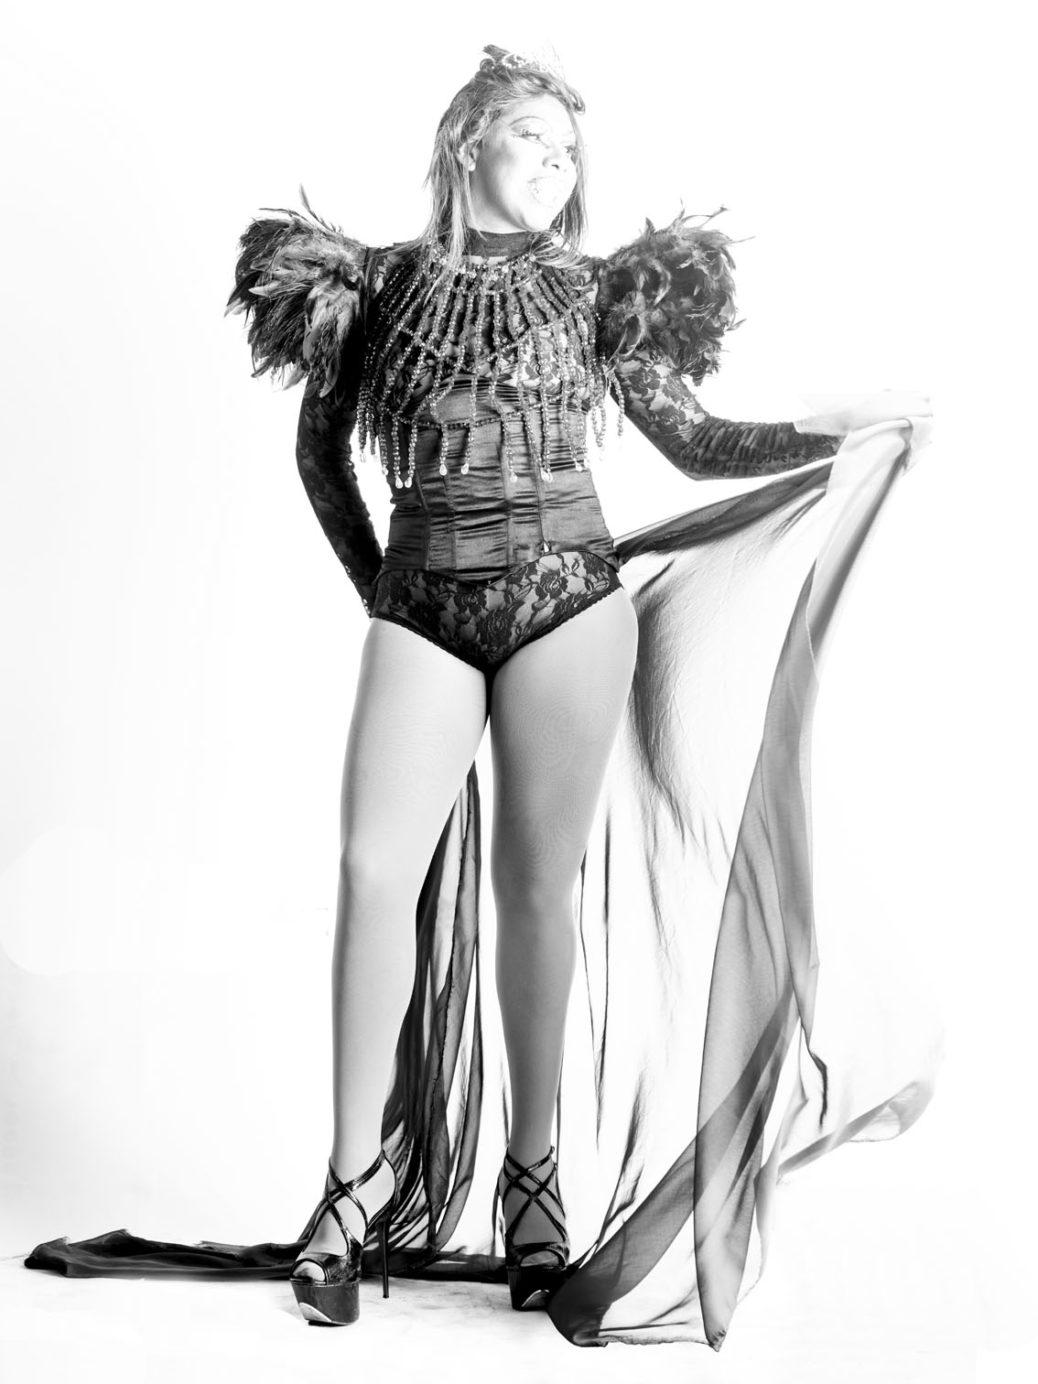 Bolivian drag queen